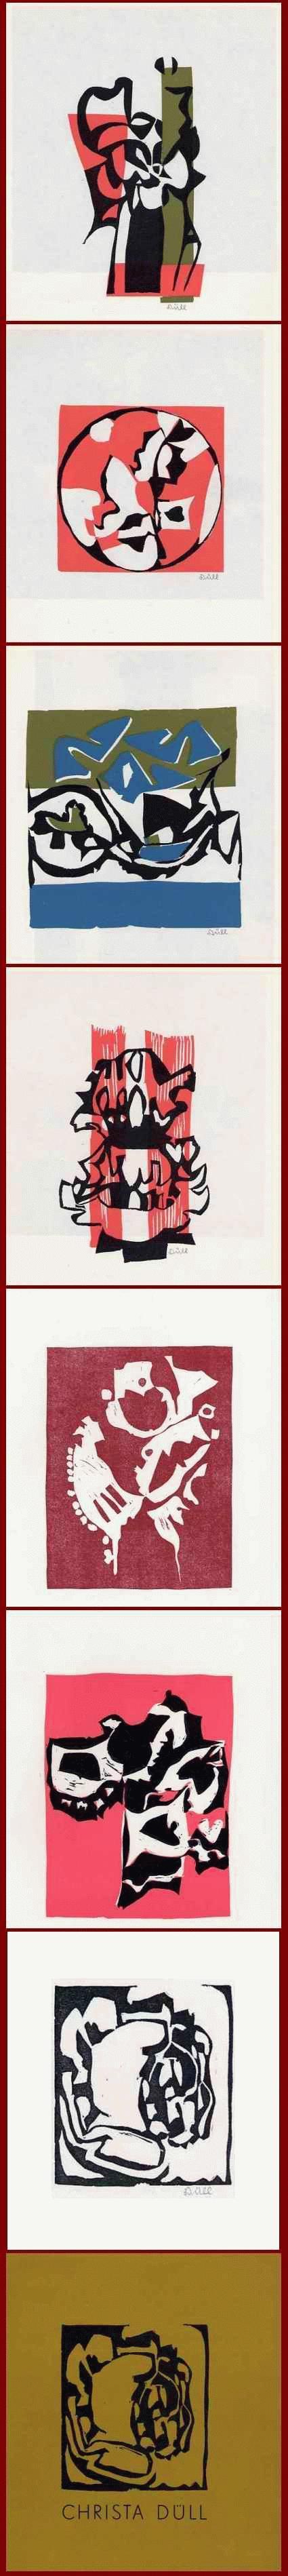 Christa Düll - - GRUPPE VIER - 8 OriginalLinolschnitte der MEISTERSCHÜLERIN bei Karl HOFER - 5 x handsigniert 1982 kopen? Bied vanaf 65!